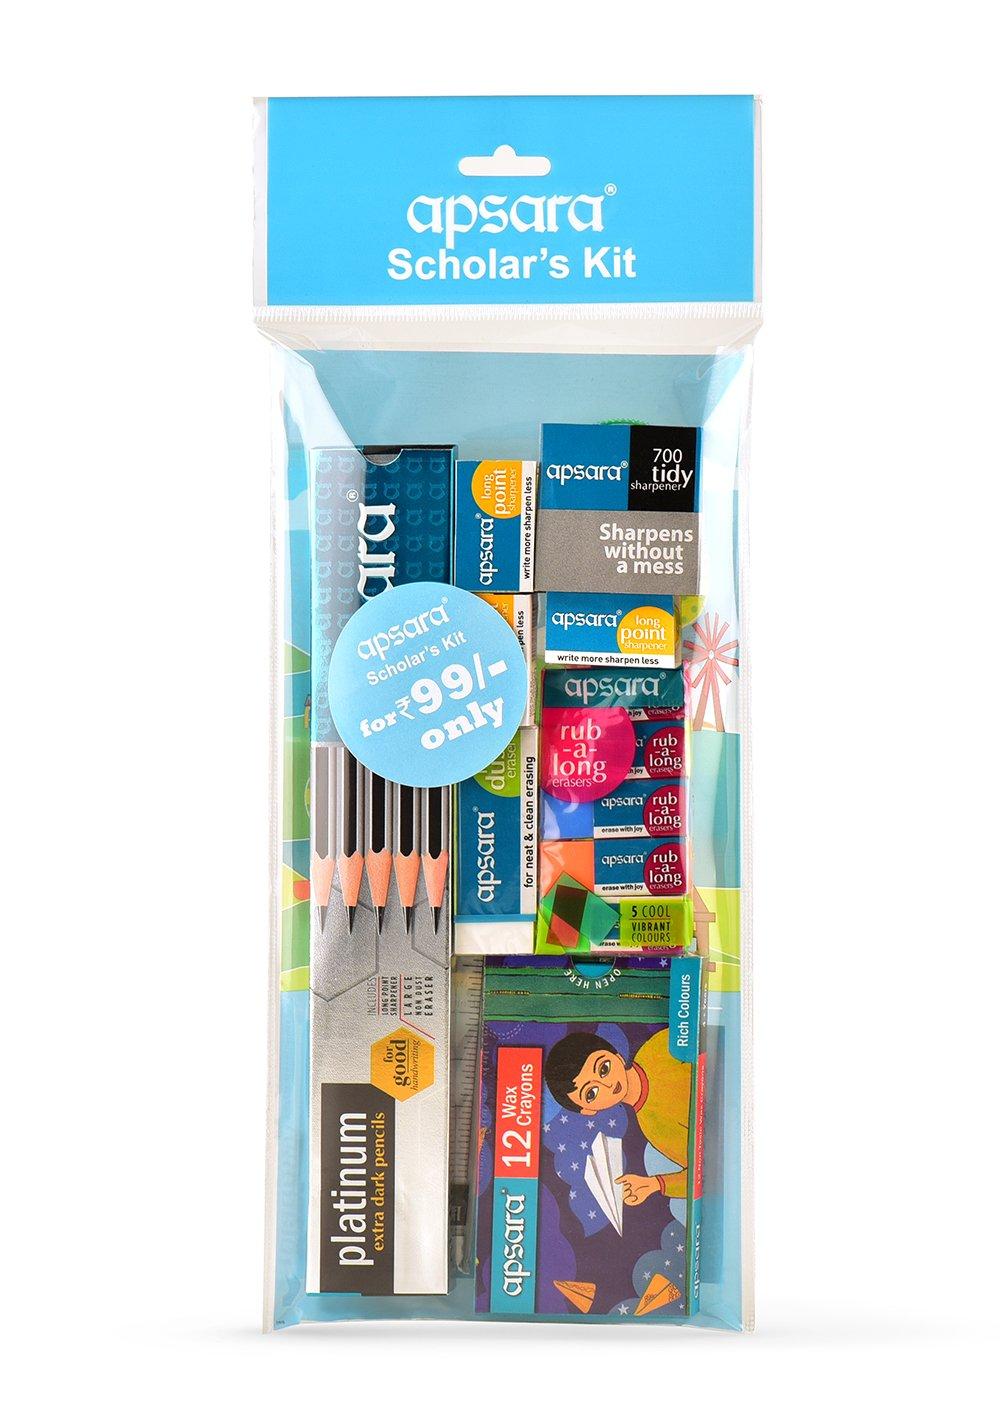 Apsara Scholars Kit product image